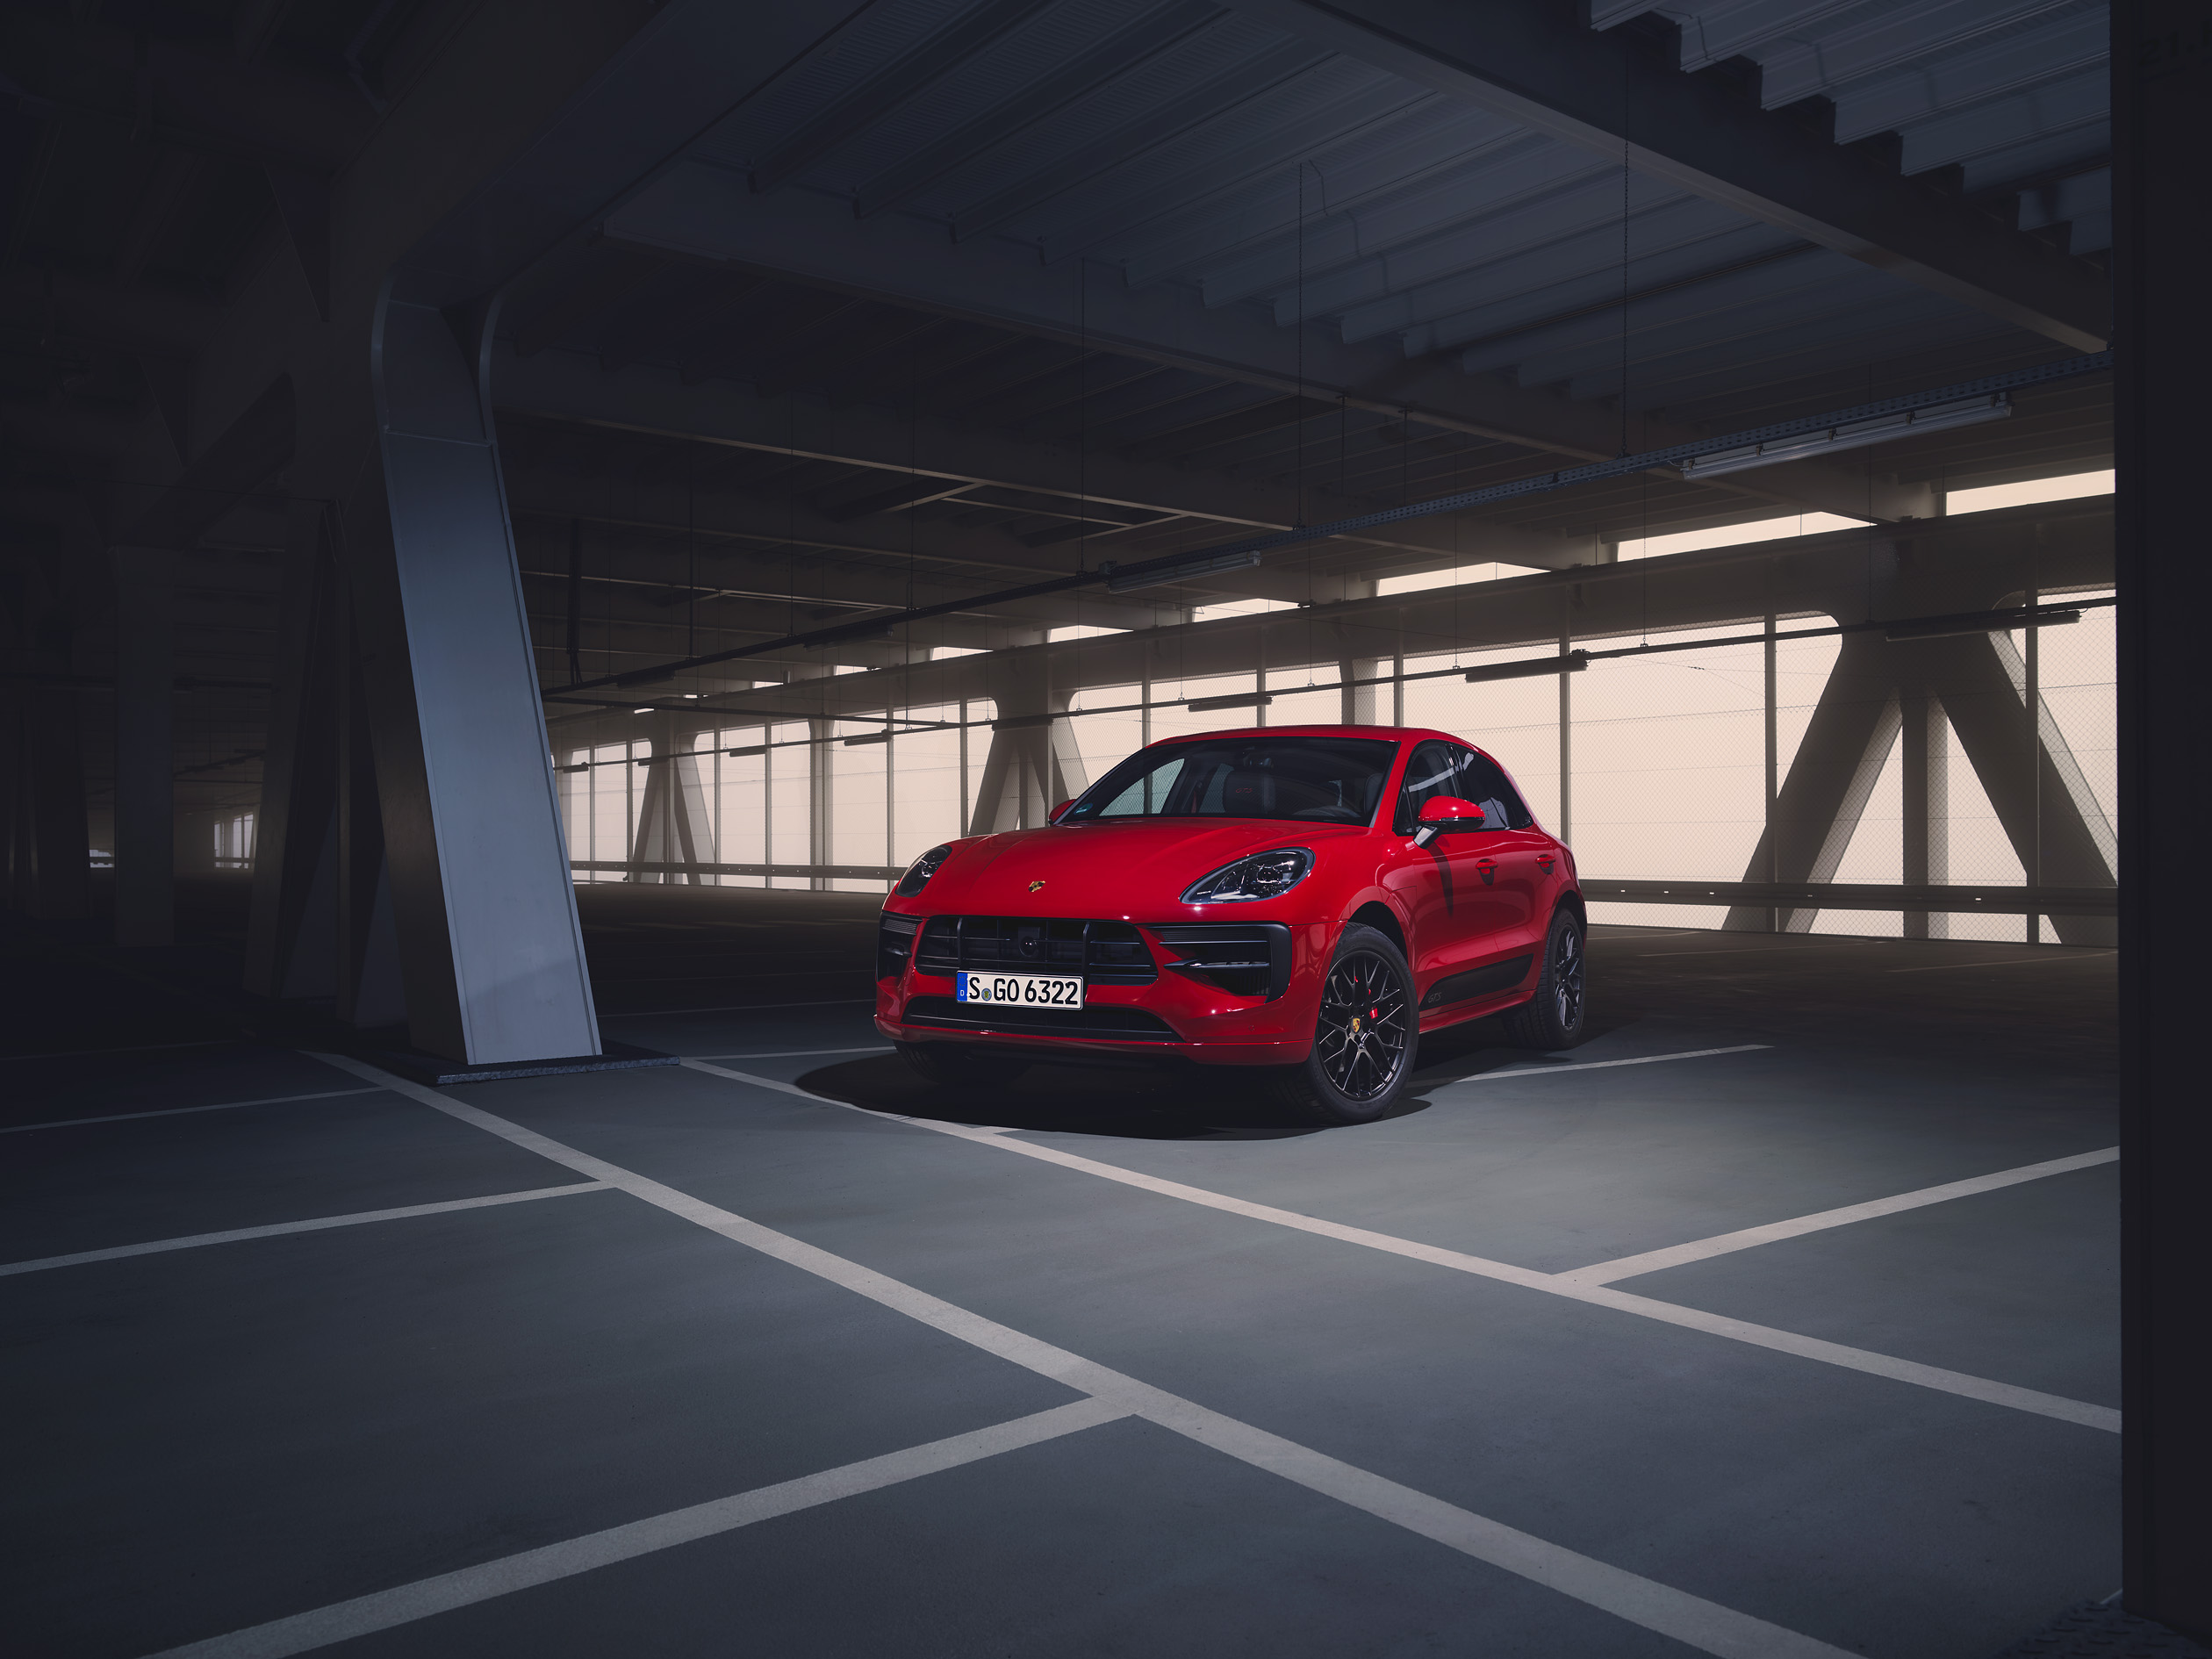 Model nou GTS de la Porsche: cel mai sportiv Macan